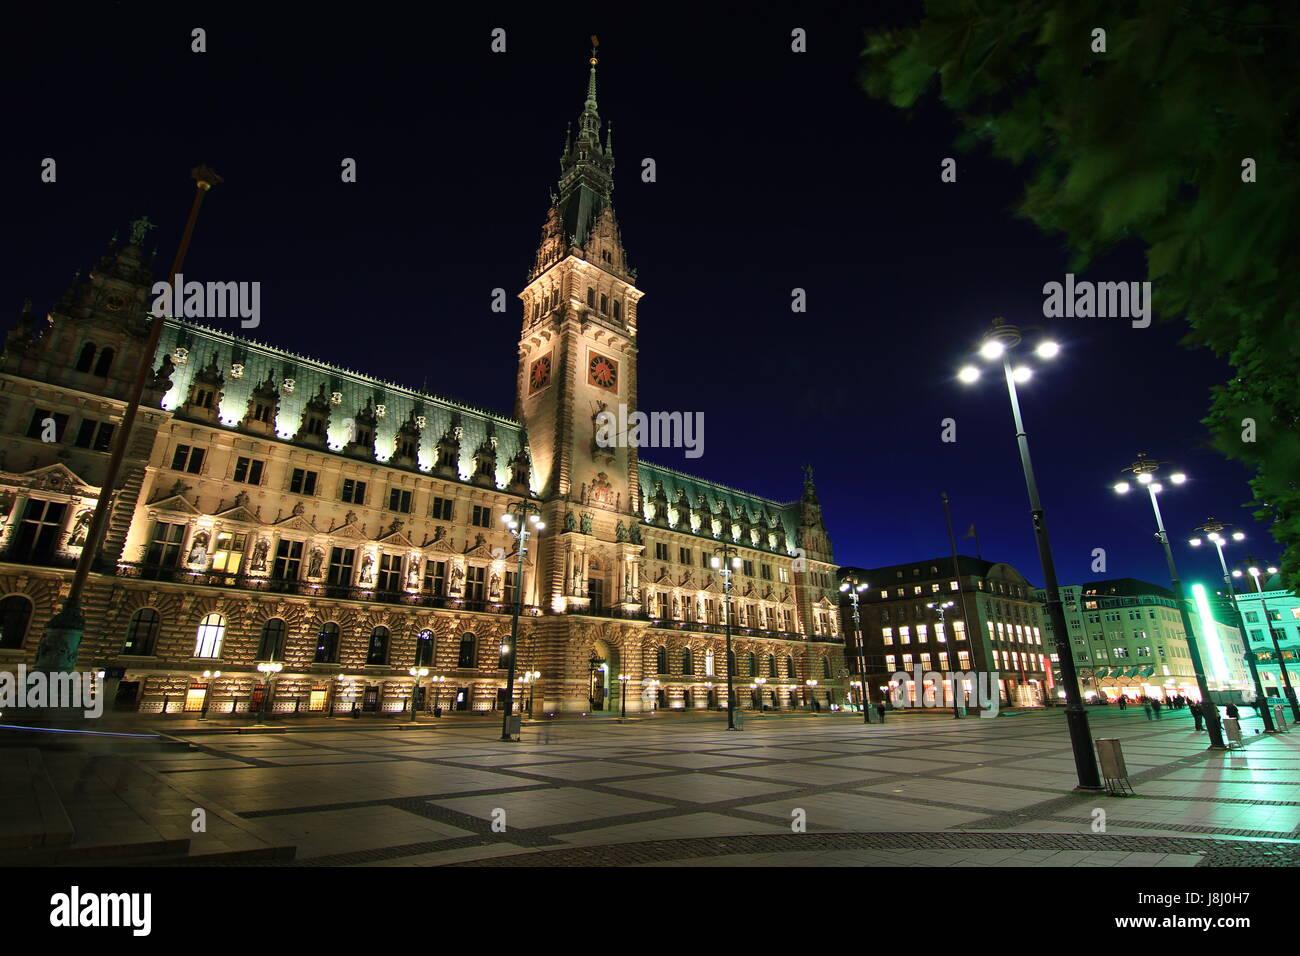 harbor, hamburg, harbours, tower, church, city, town, metropolis, tree, trees, - Stock Image